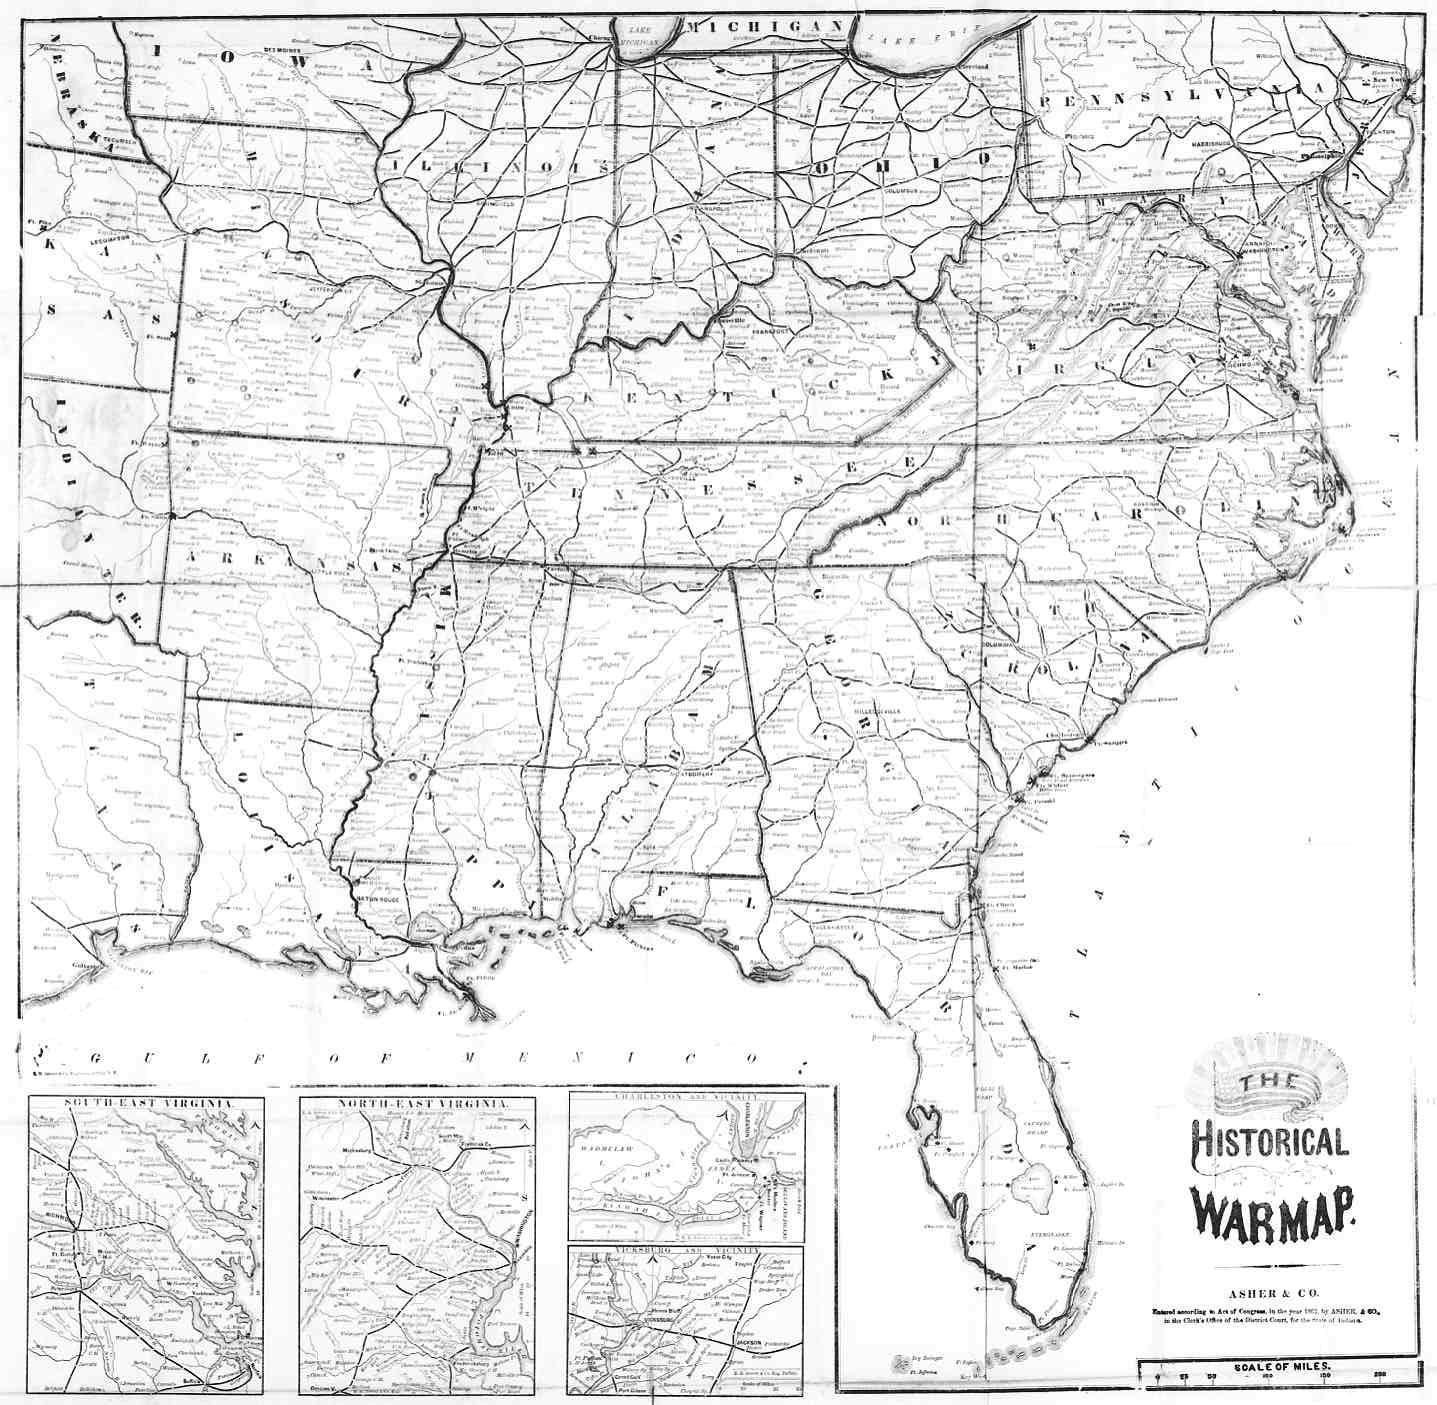 FileThe historical war map Hudson Taylor 1862jpg Wikimedia Commons